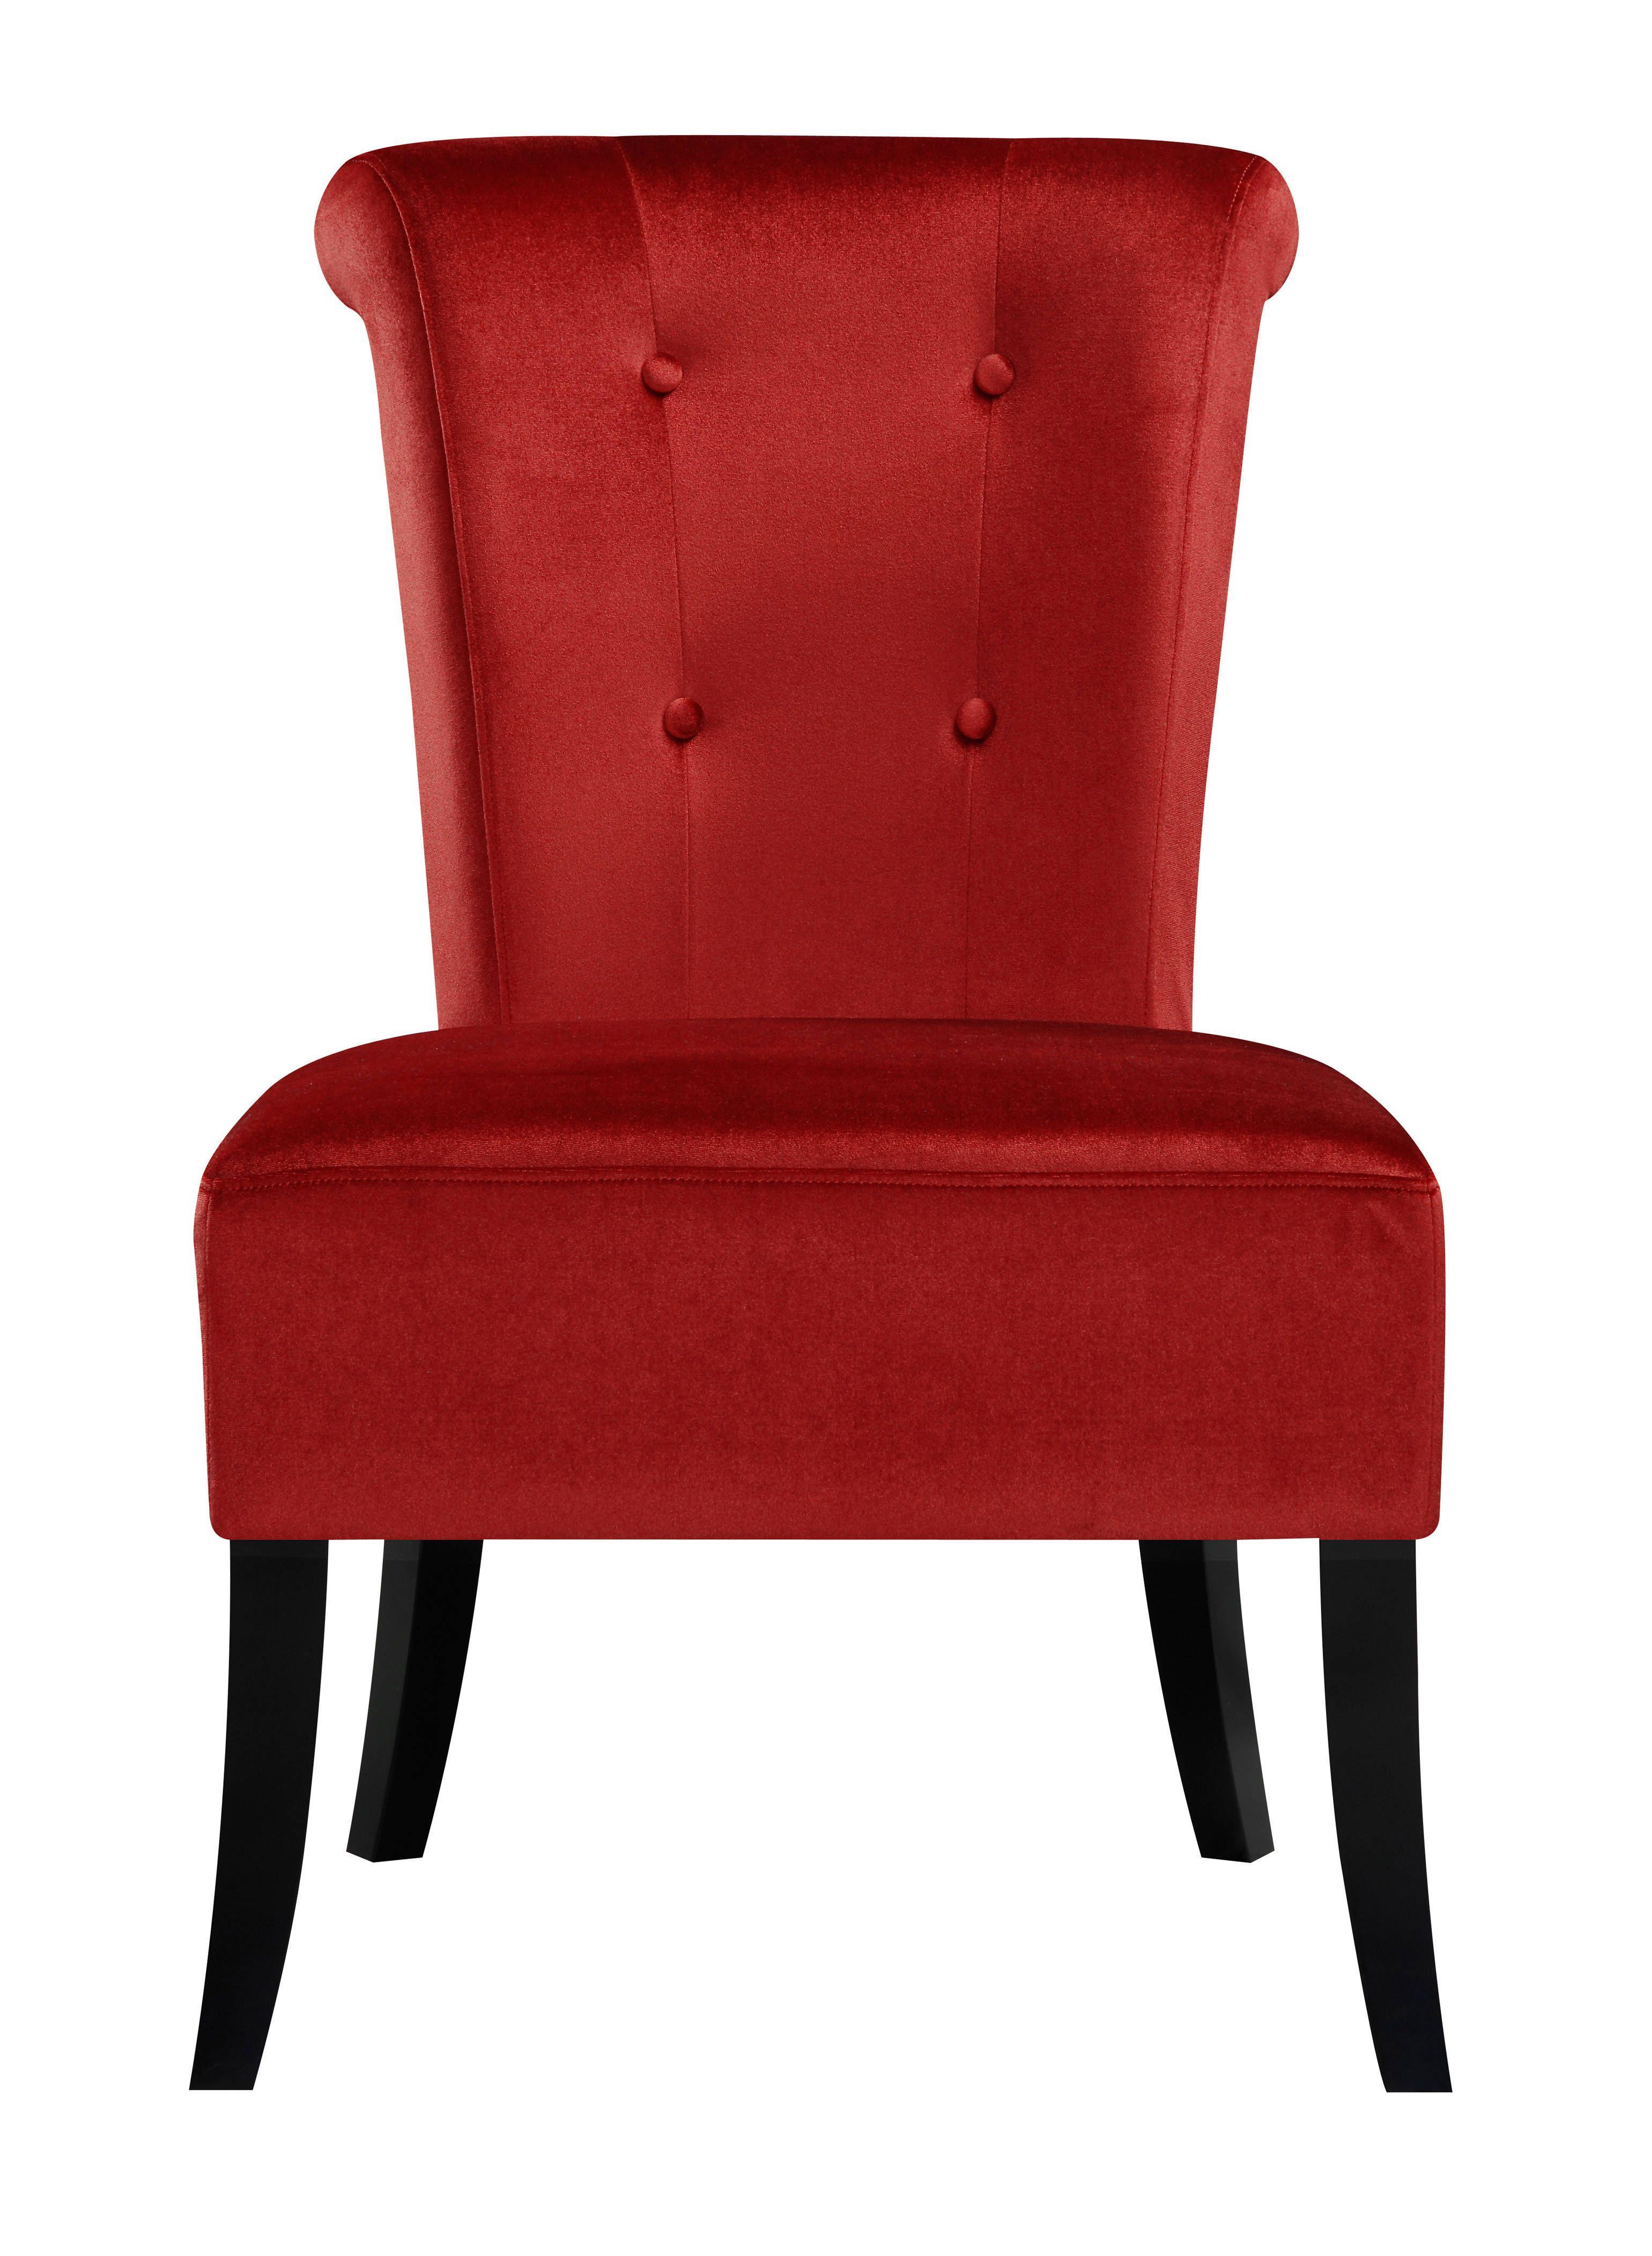 Contemporary Red Hardwood Fabric Carolina Crimson Dining Chair